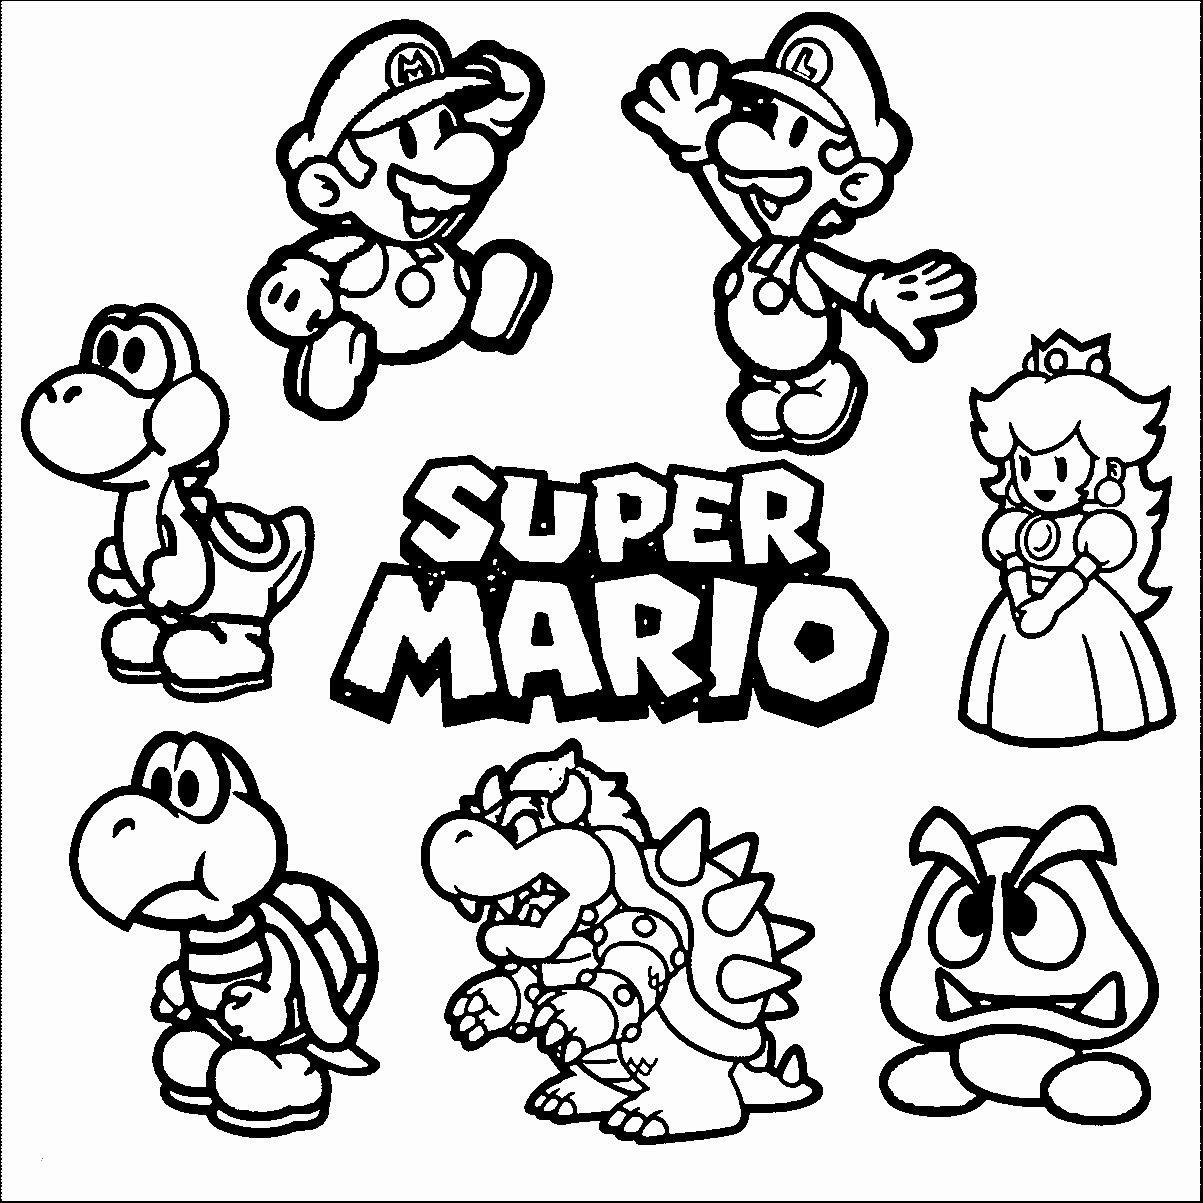 Ausmalbilder Mario Kart Inspirierend 40 Bvb Ausmalbilder Scoredatscore Inspirierend Mario Kart Bilder